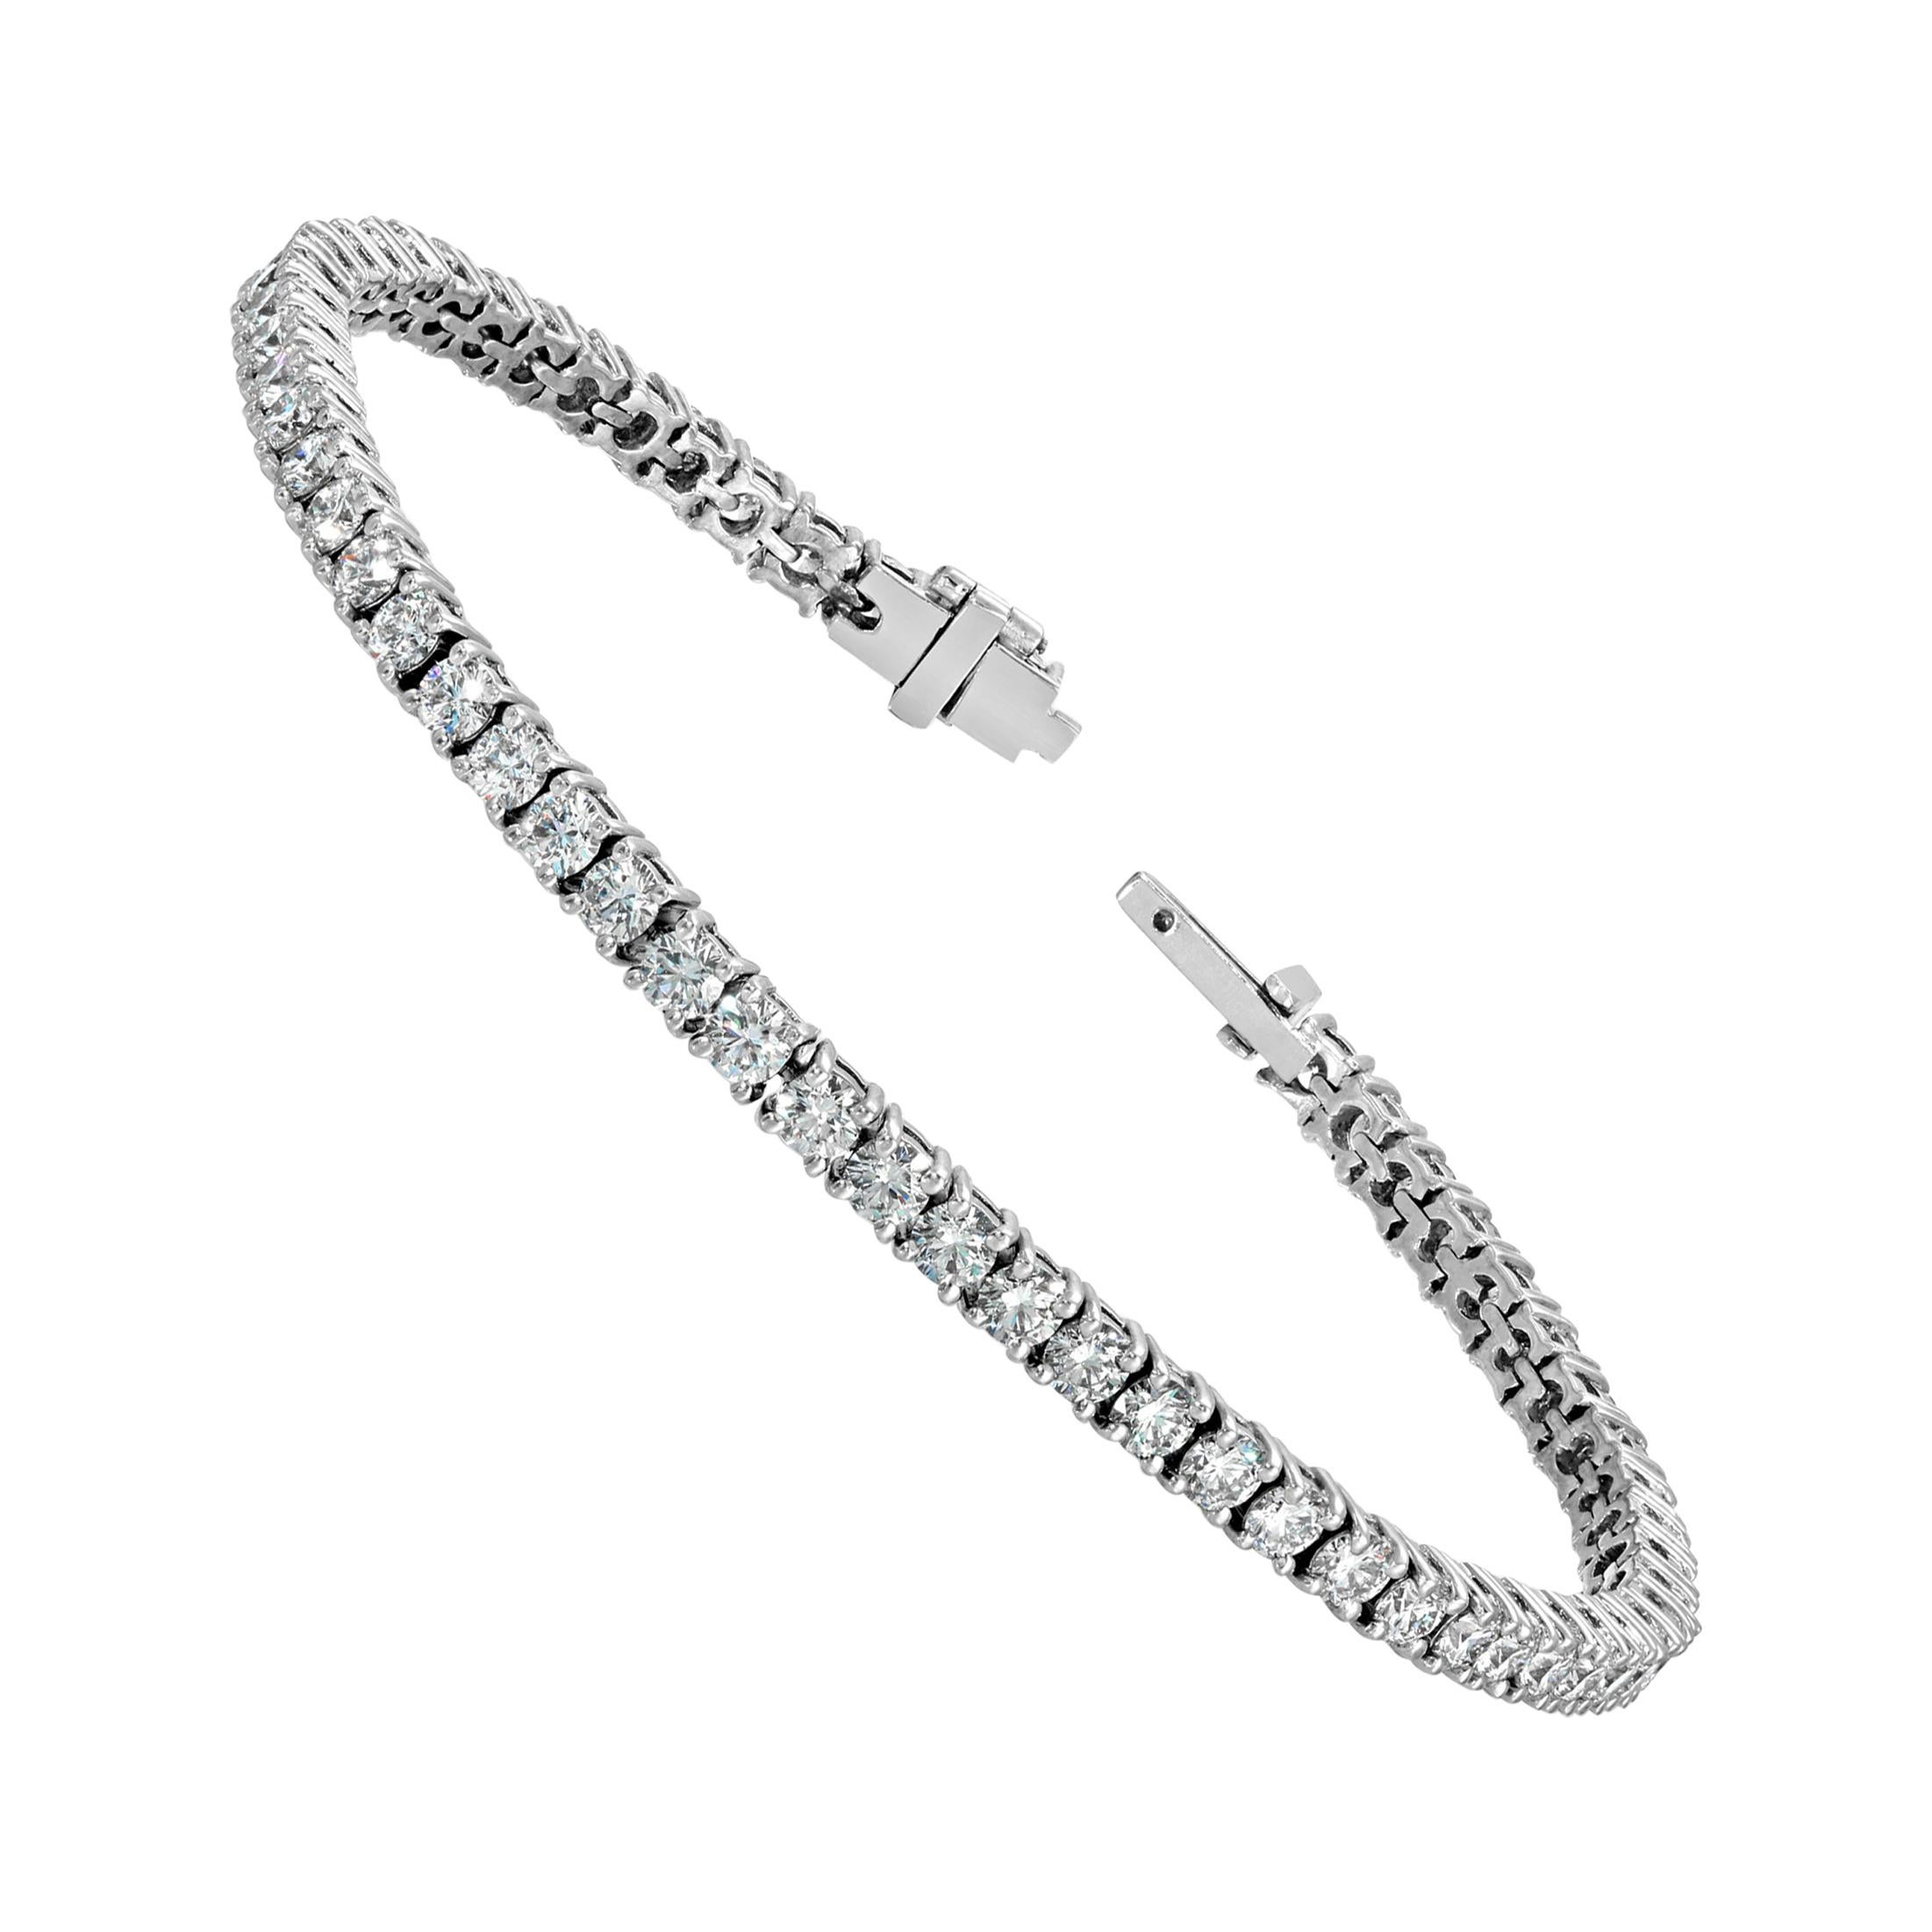 Diamond Tennis Bracelet 4.93 Carat DEF Color VS2 18 Karat White Gold